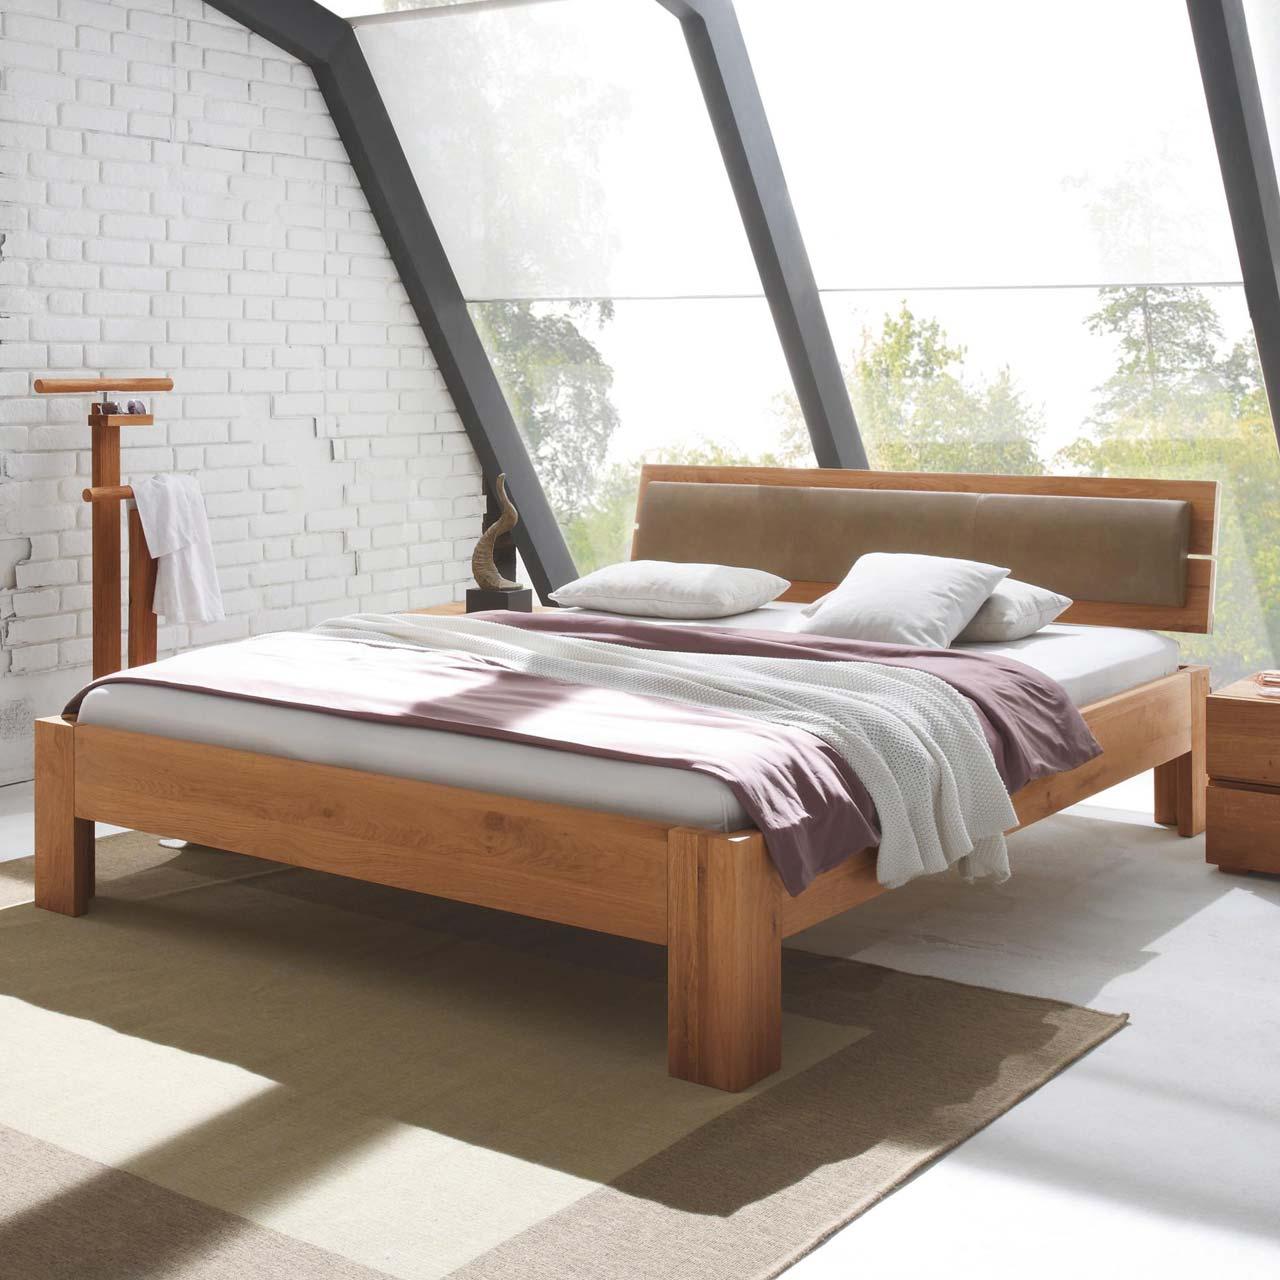 hasena oak line massivholzbett alpa lumo corno. Black Bedroom Furniture Sets. Home Design Ideas